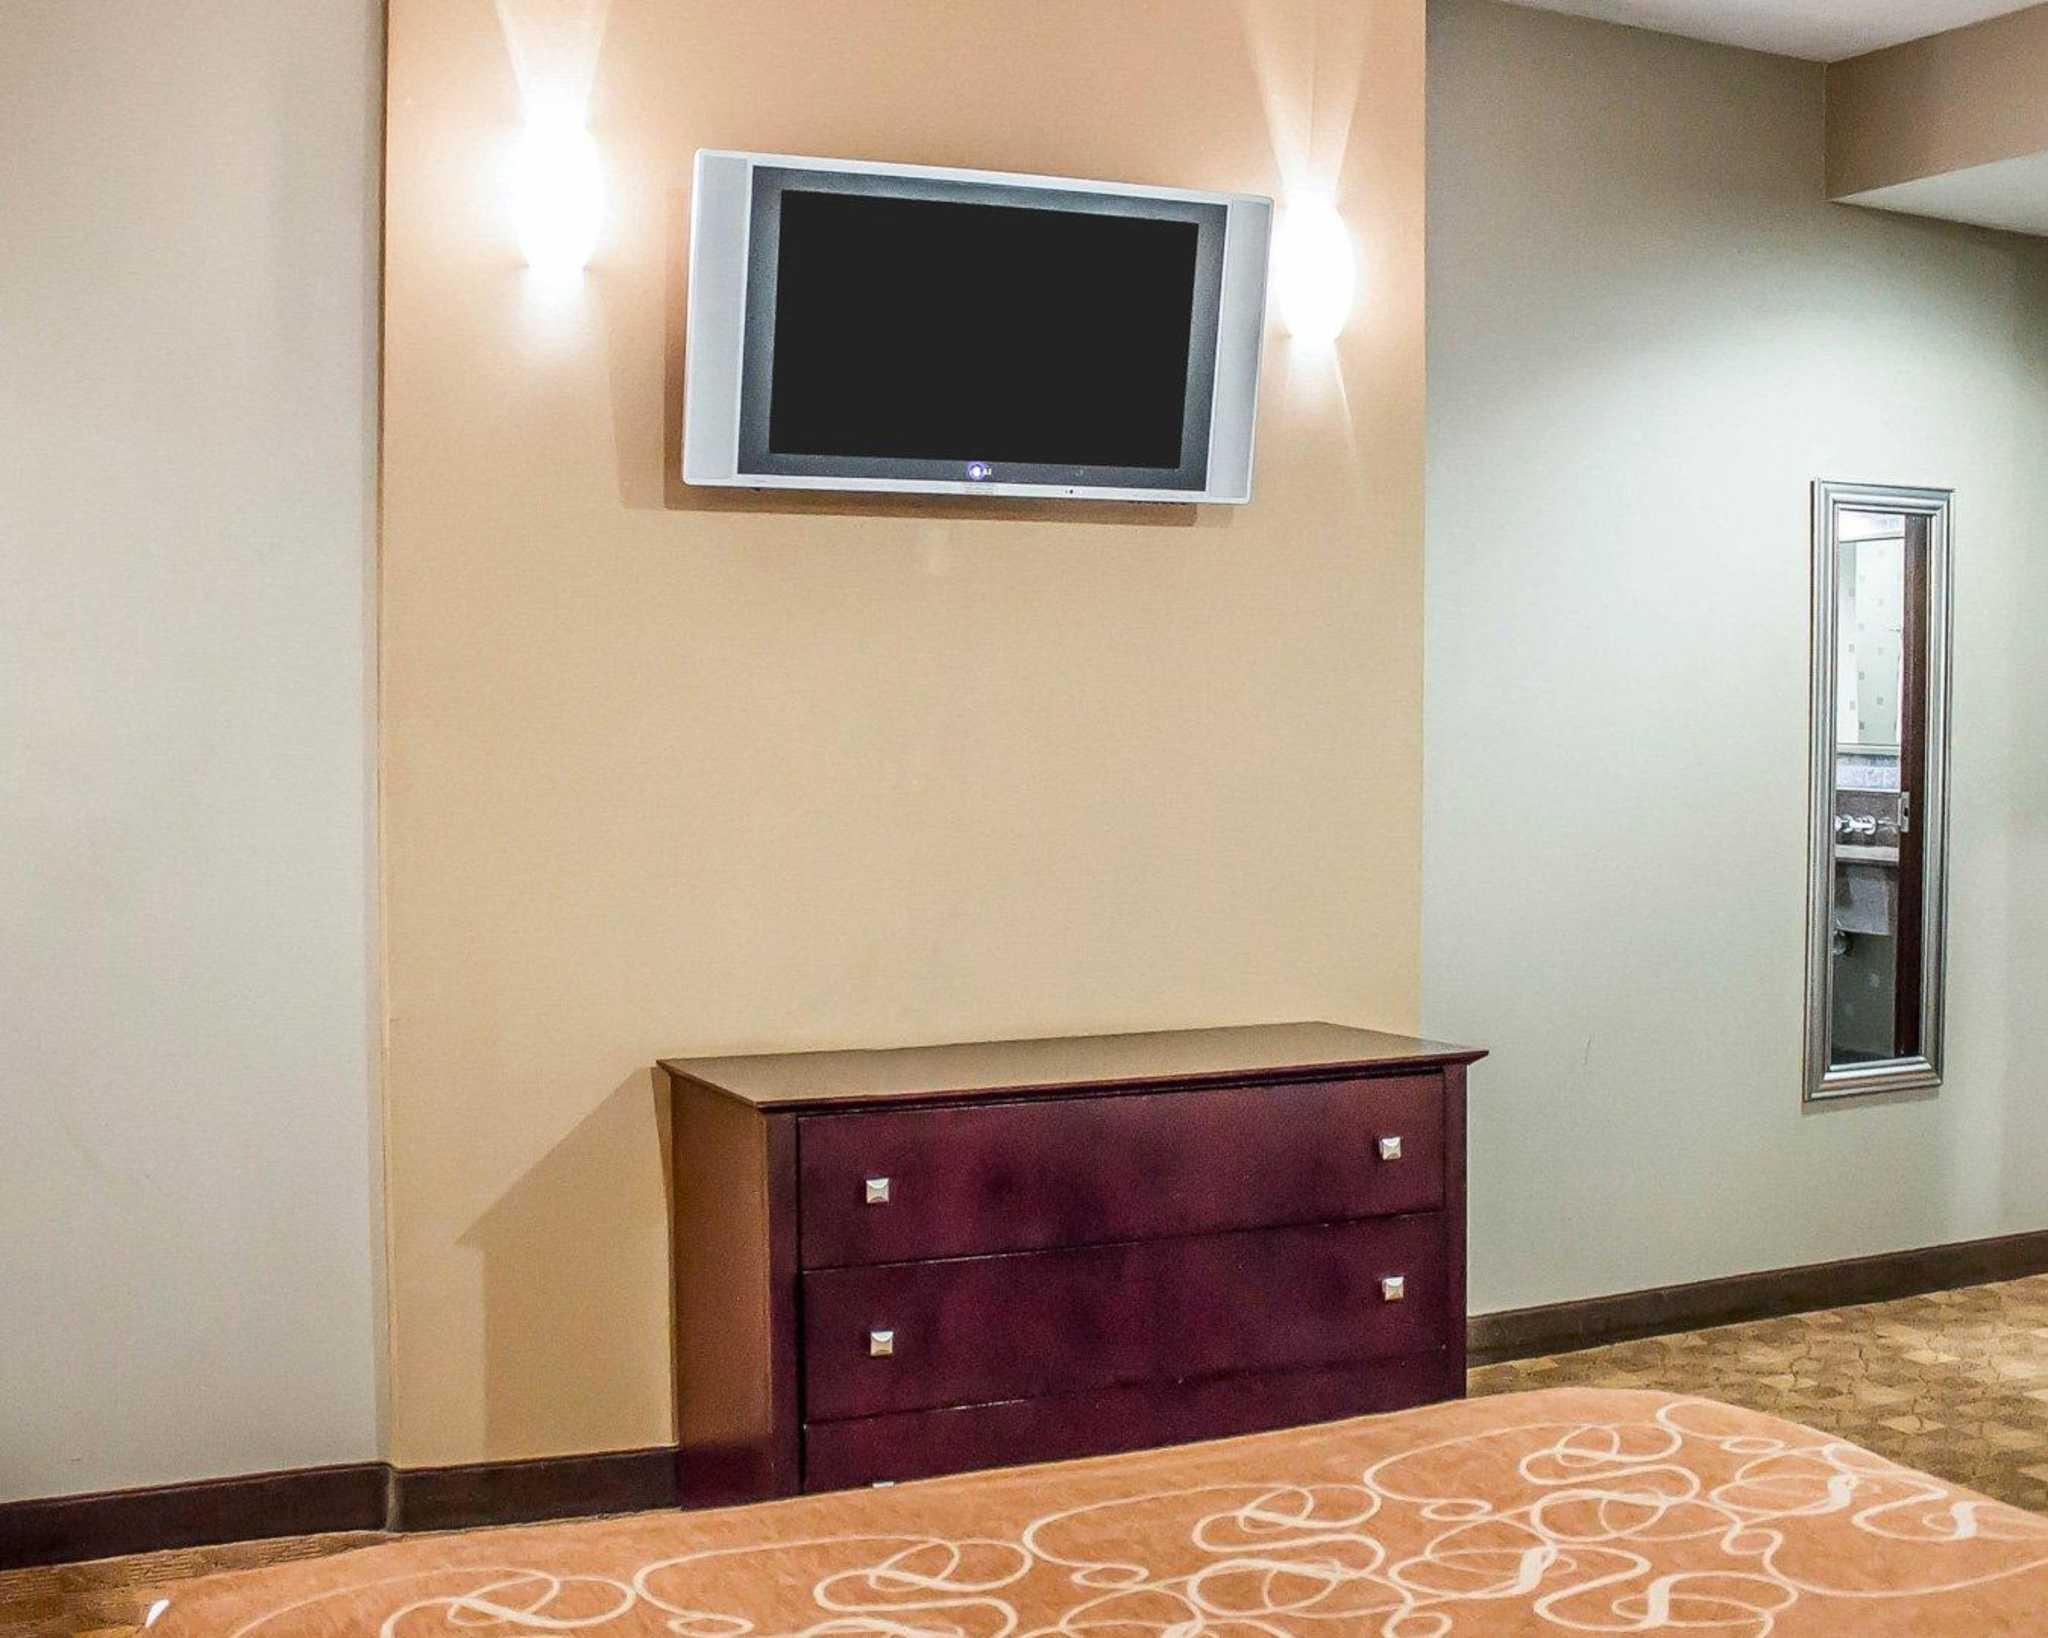 Comfort Suites Perrysburg - Toledo South image 6